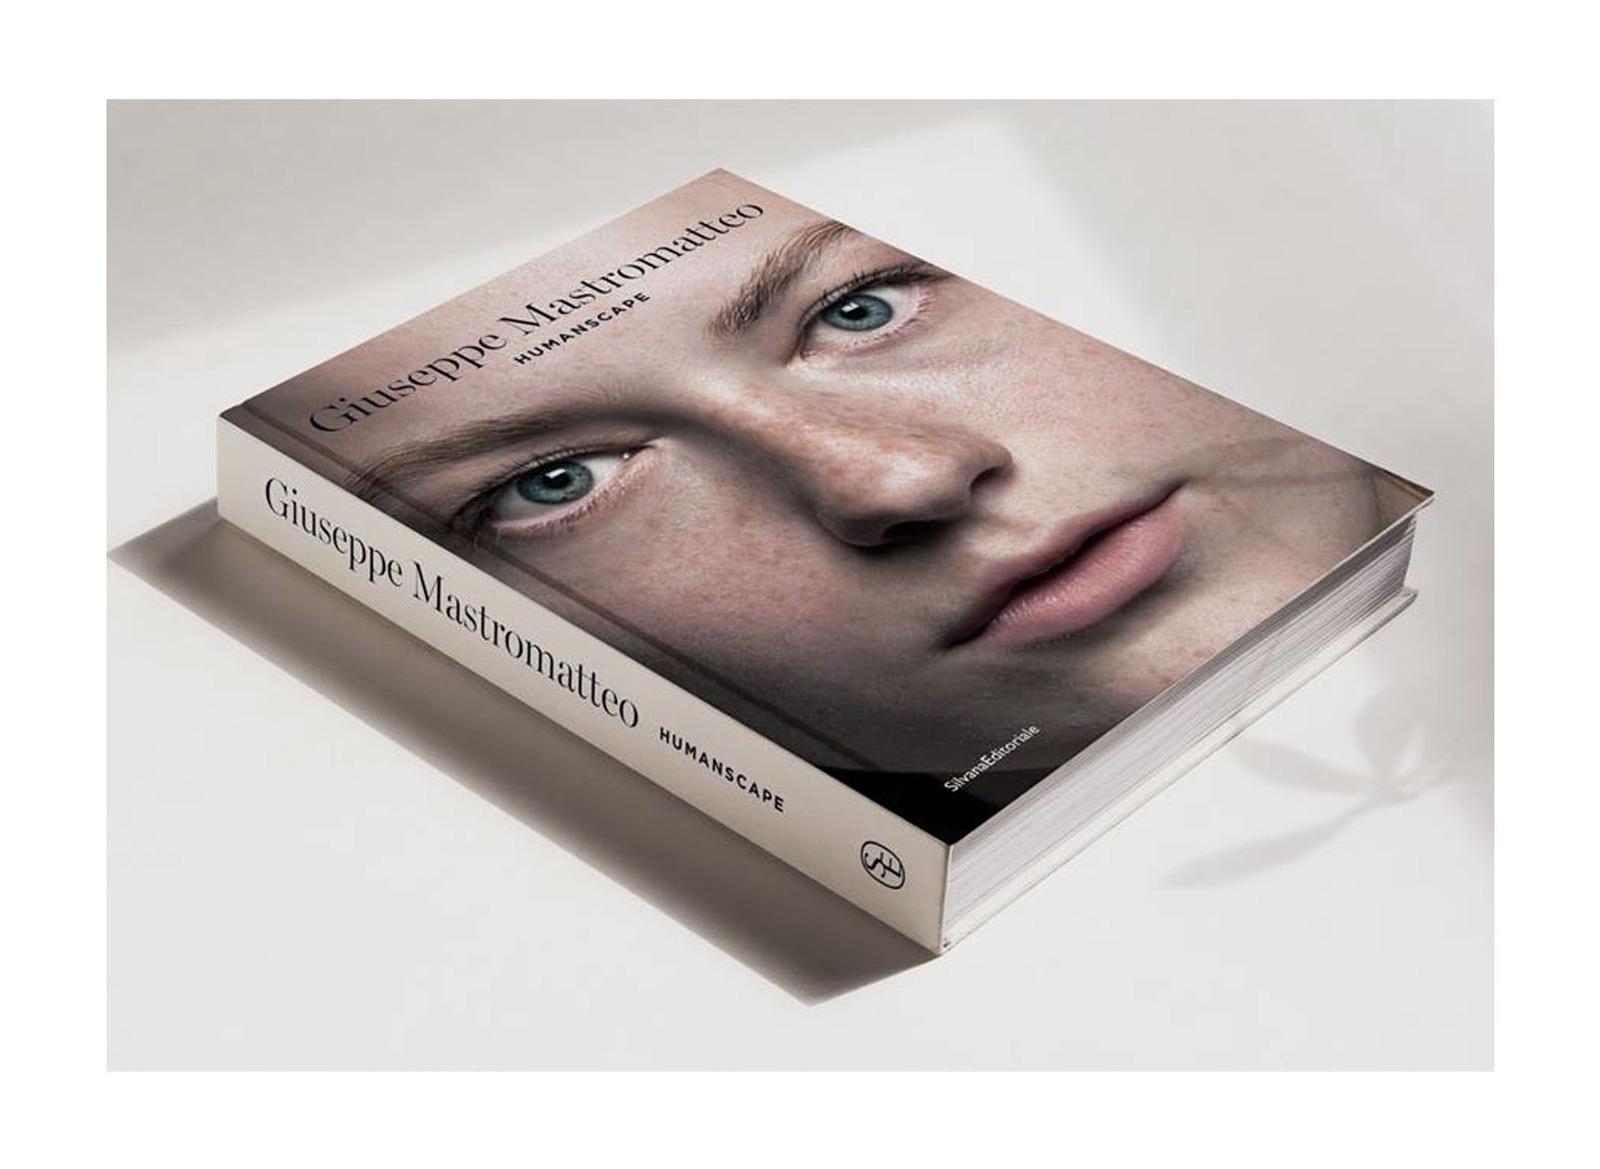 Giuseppe Mastromatteo Humanscape book